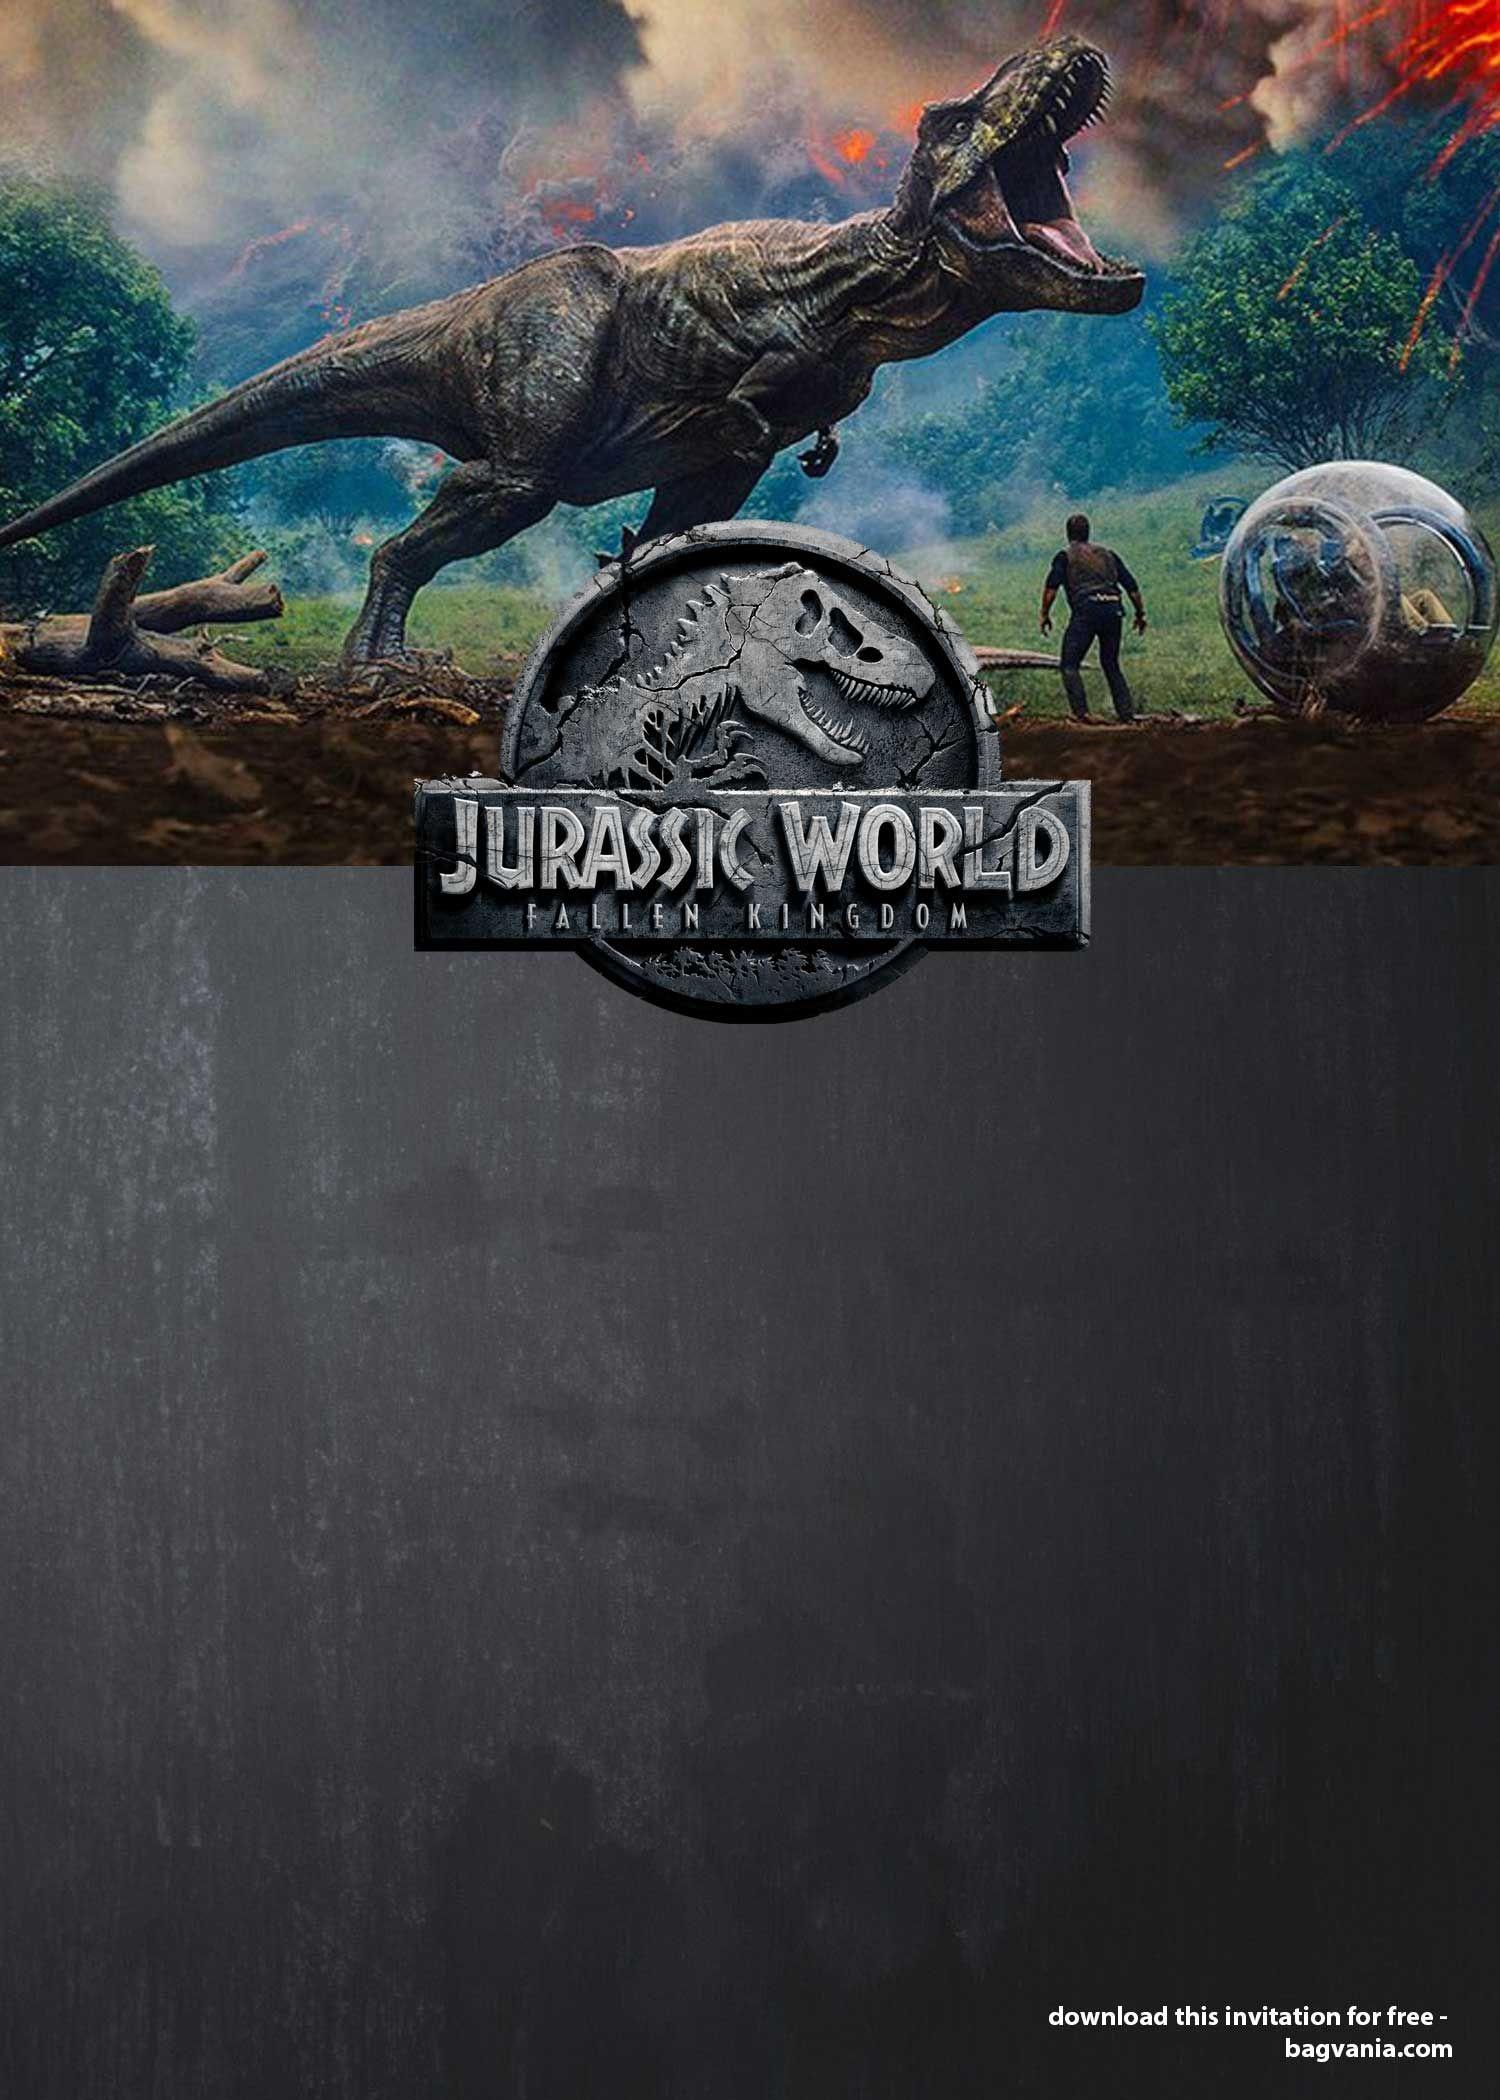 Jurassic World : Fallen Kingdom Birthday Party Ideas - Free - Jurassic World Free Printables